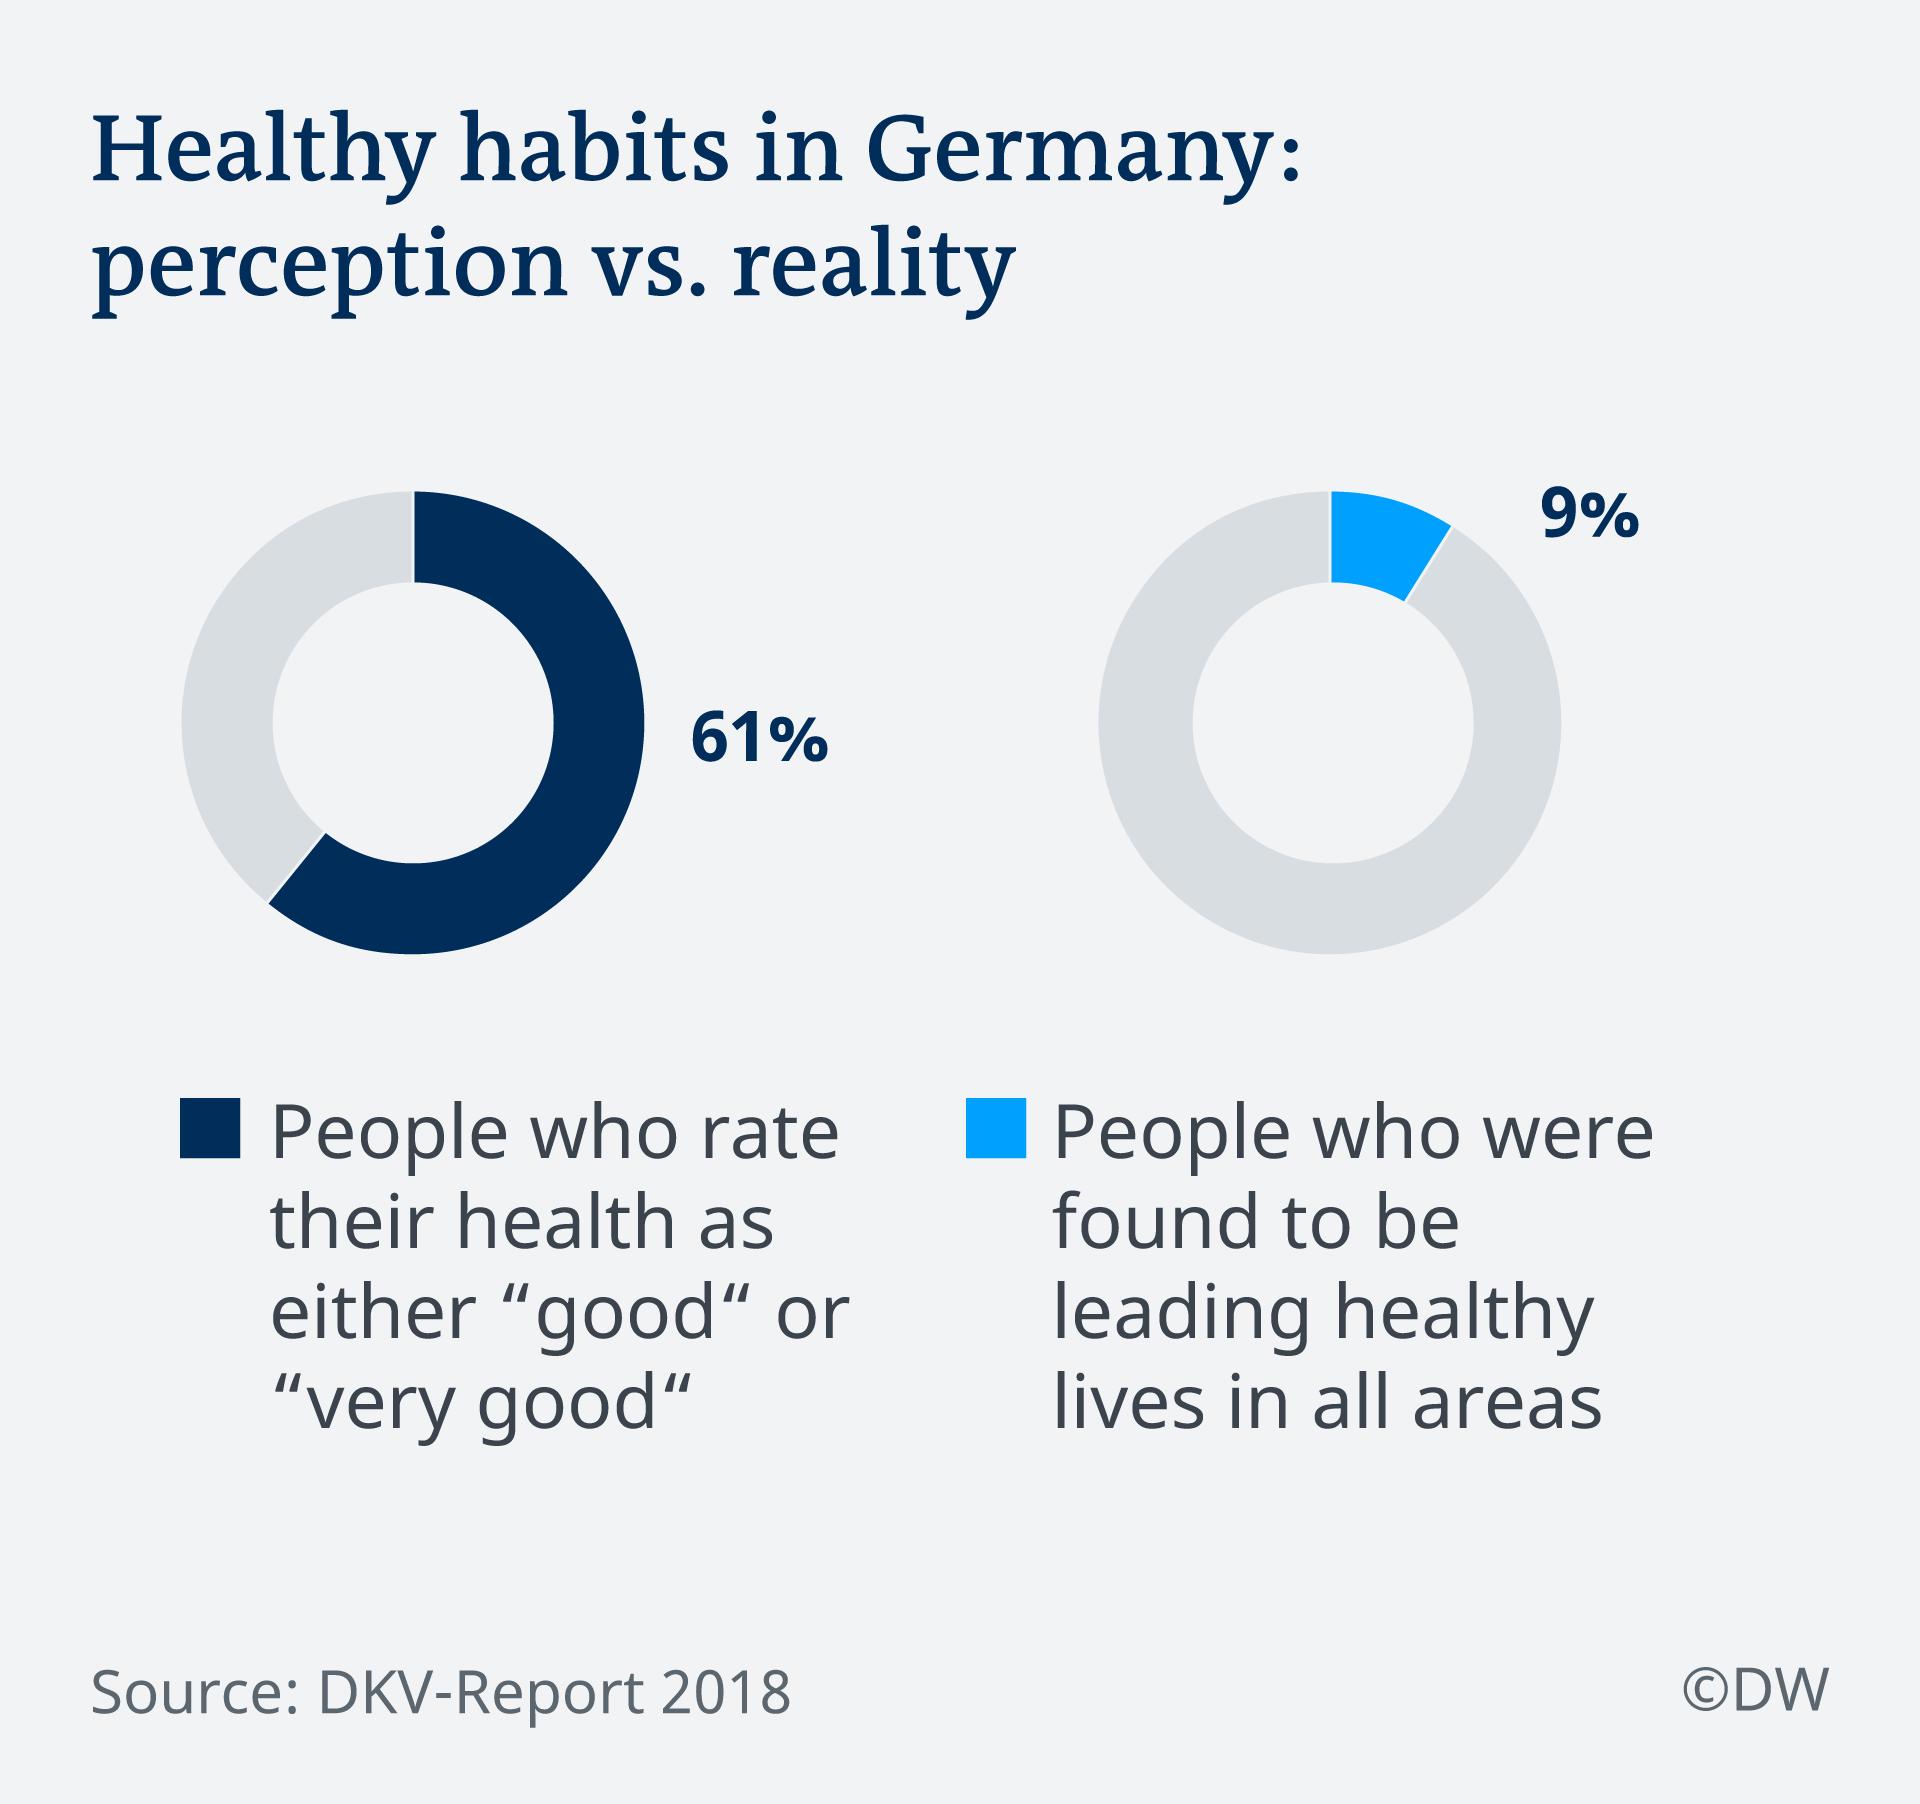 Healthy habits in Germany: perception vs. reality